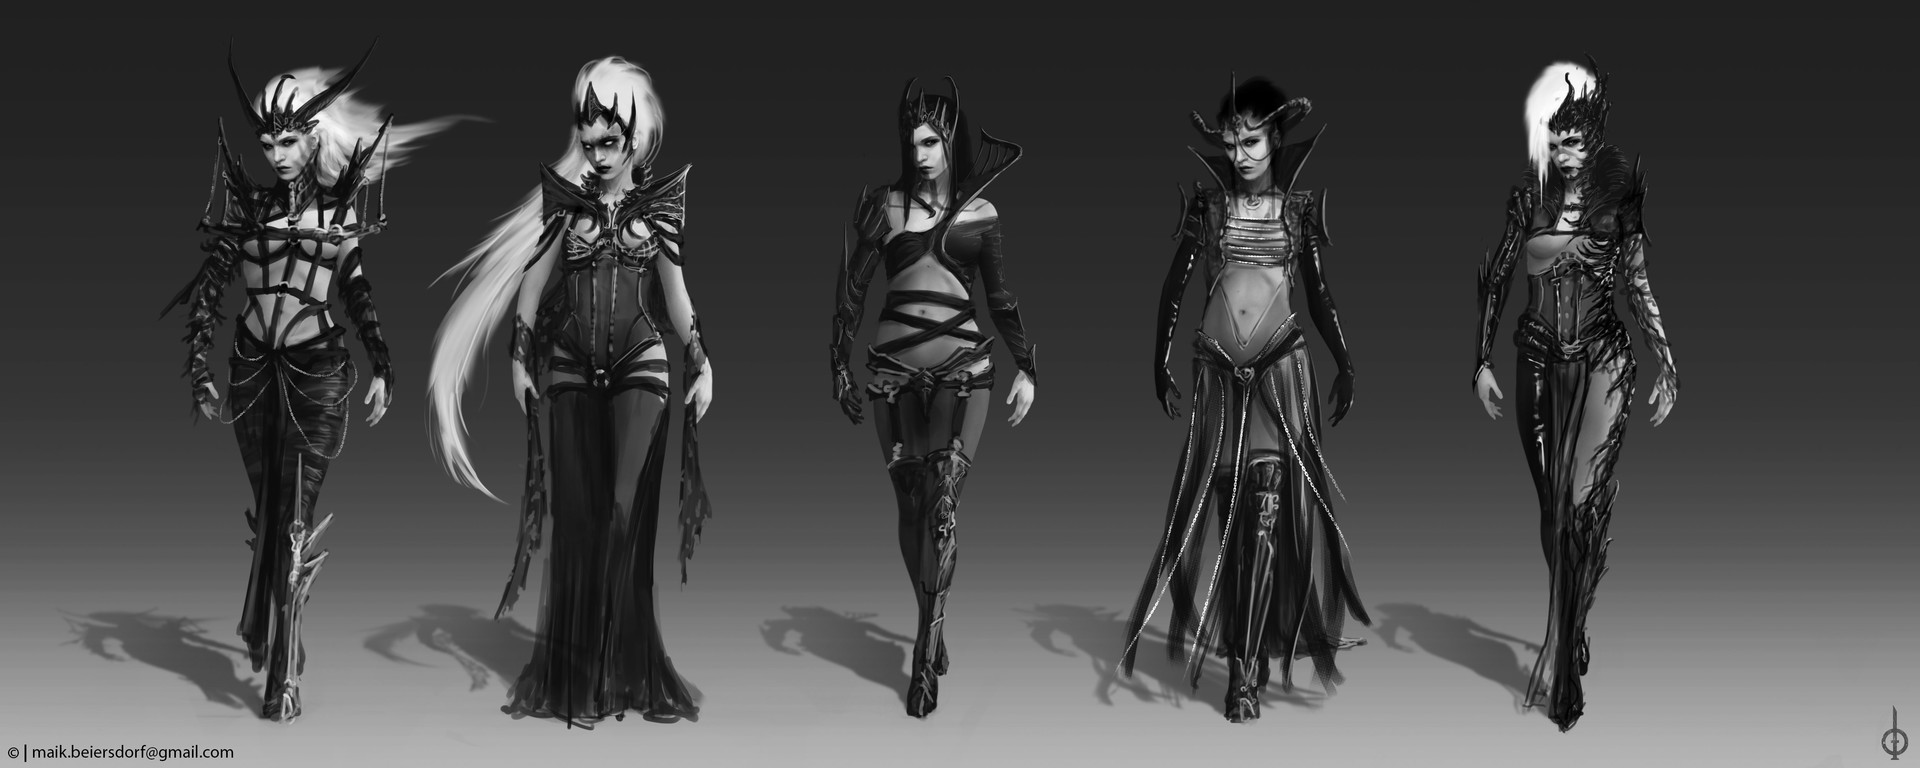 Maik beiersdorf costumedesignsheet01